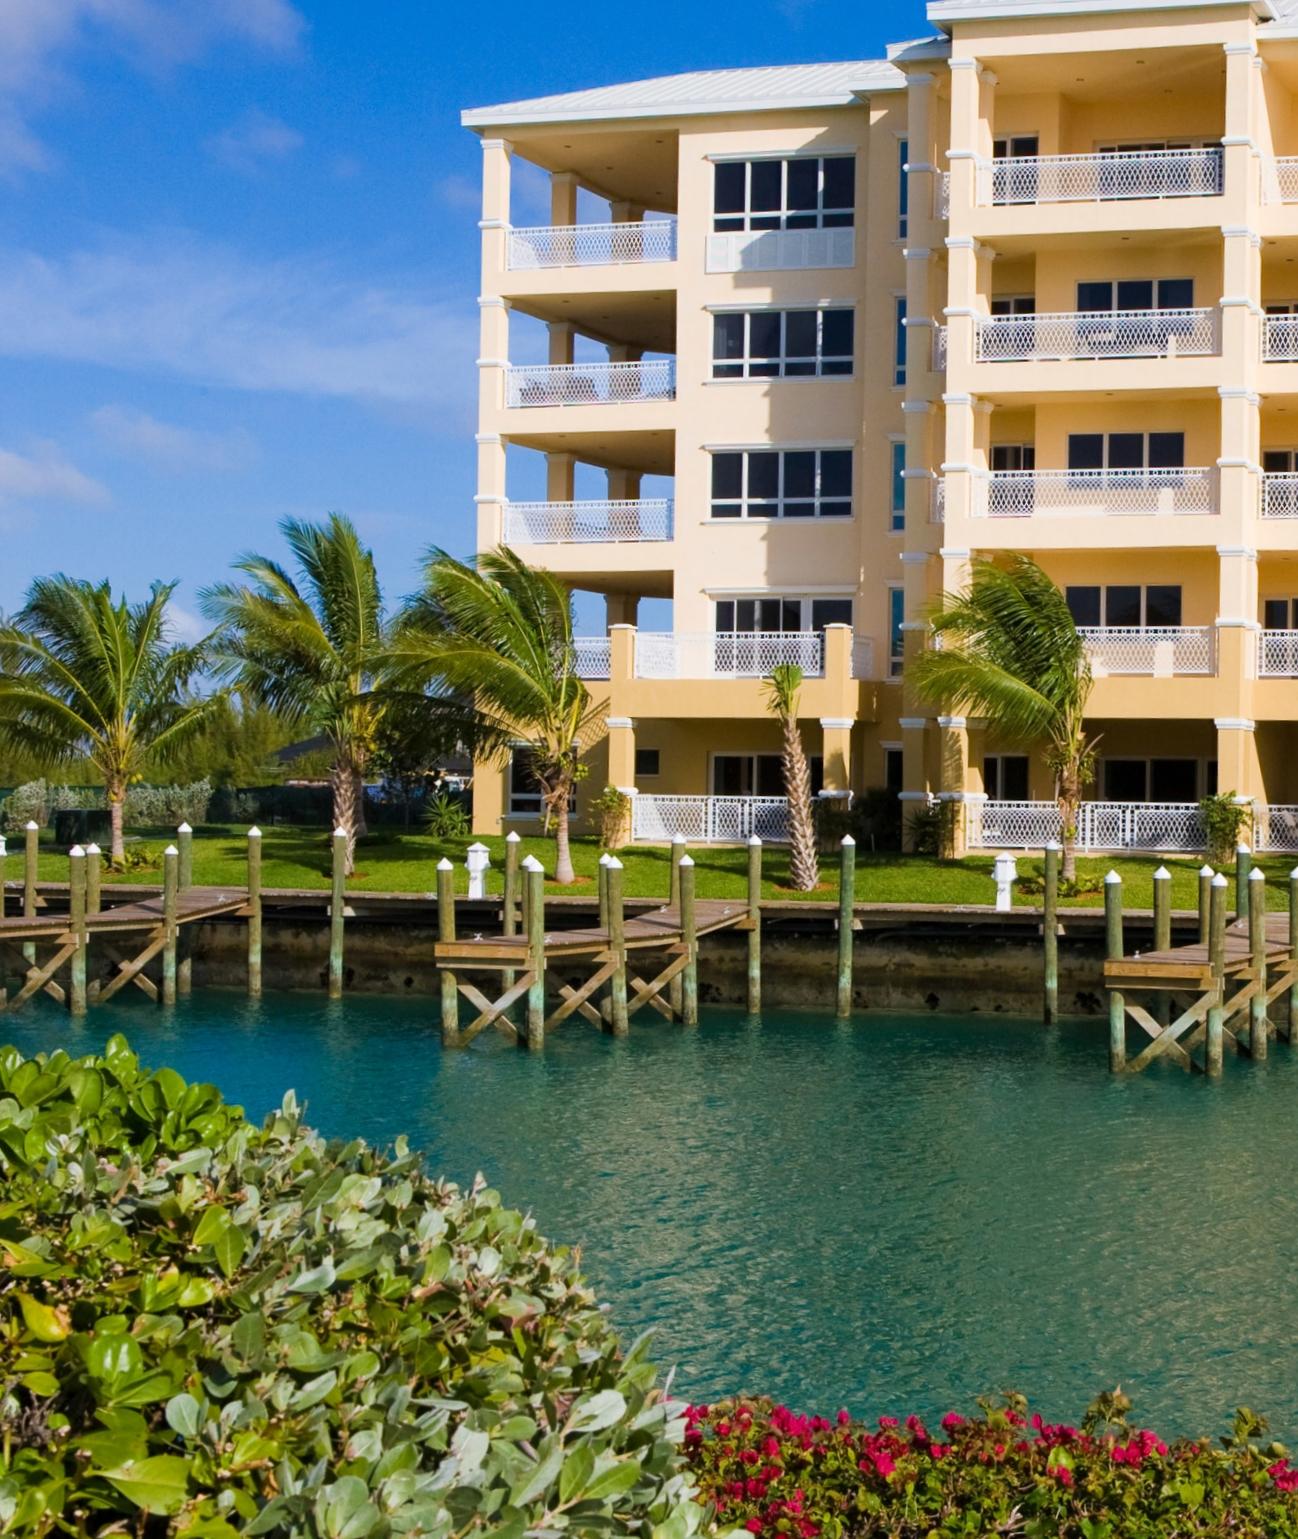 Suffolk Court Bahamas exterior day.jpg